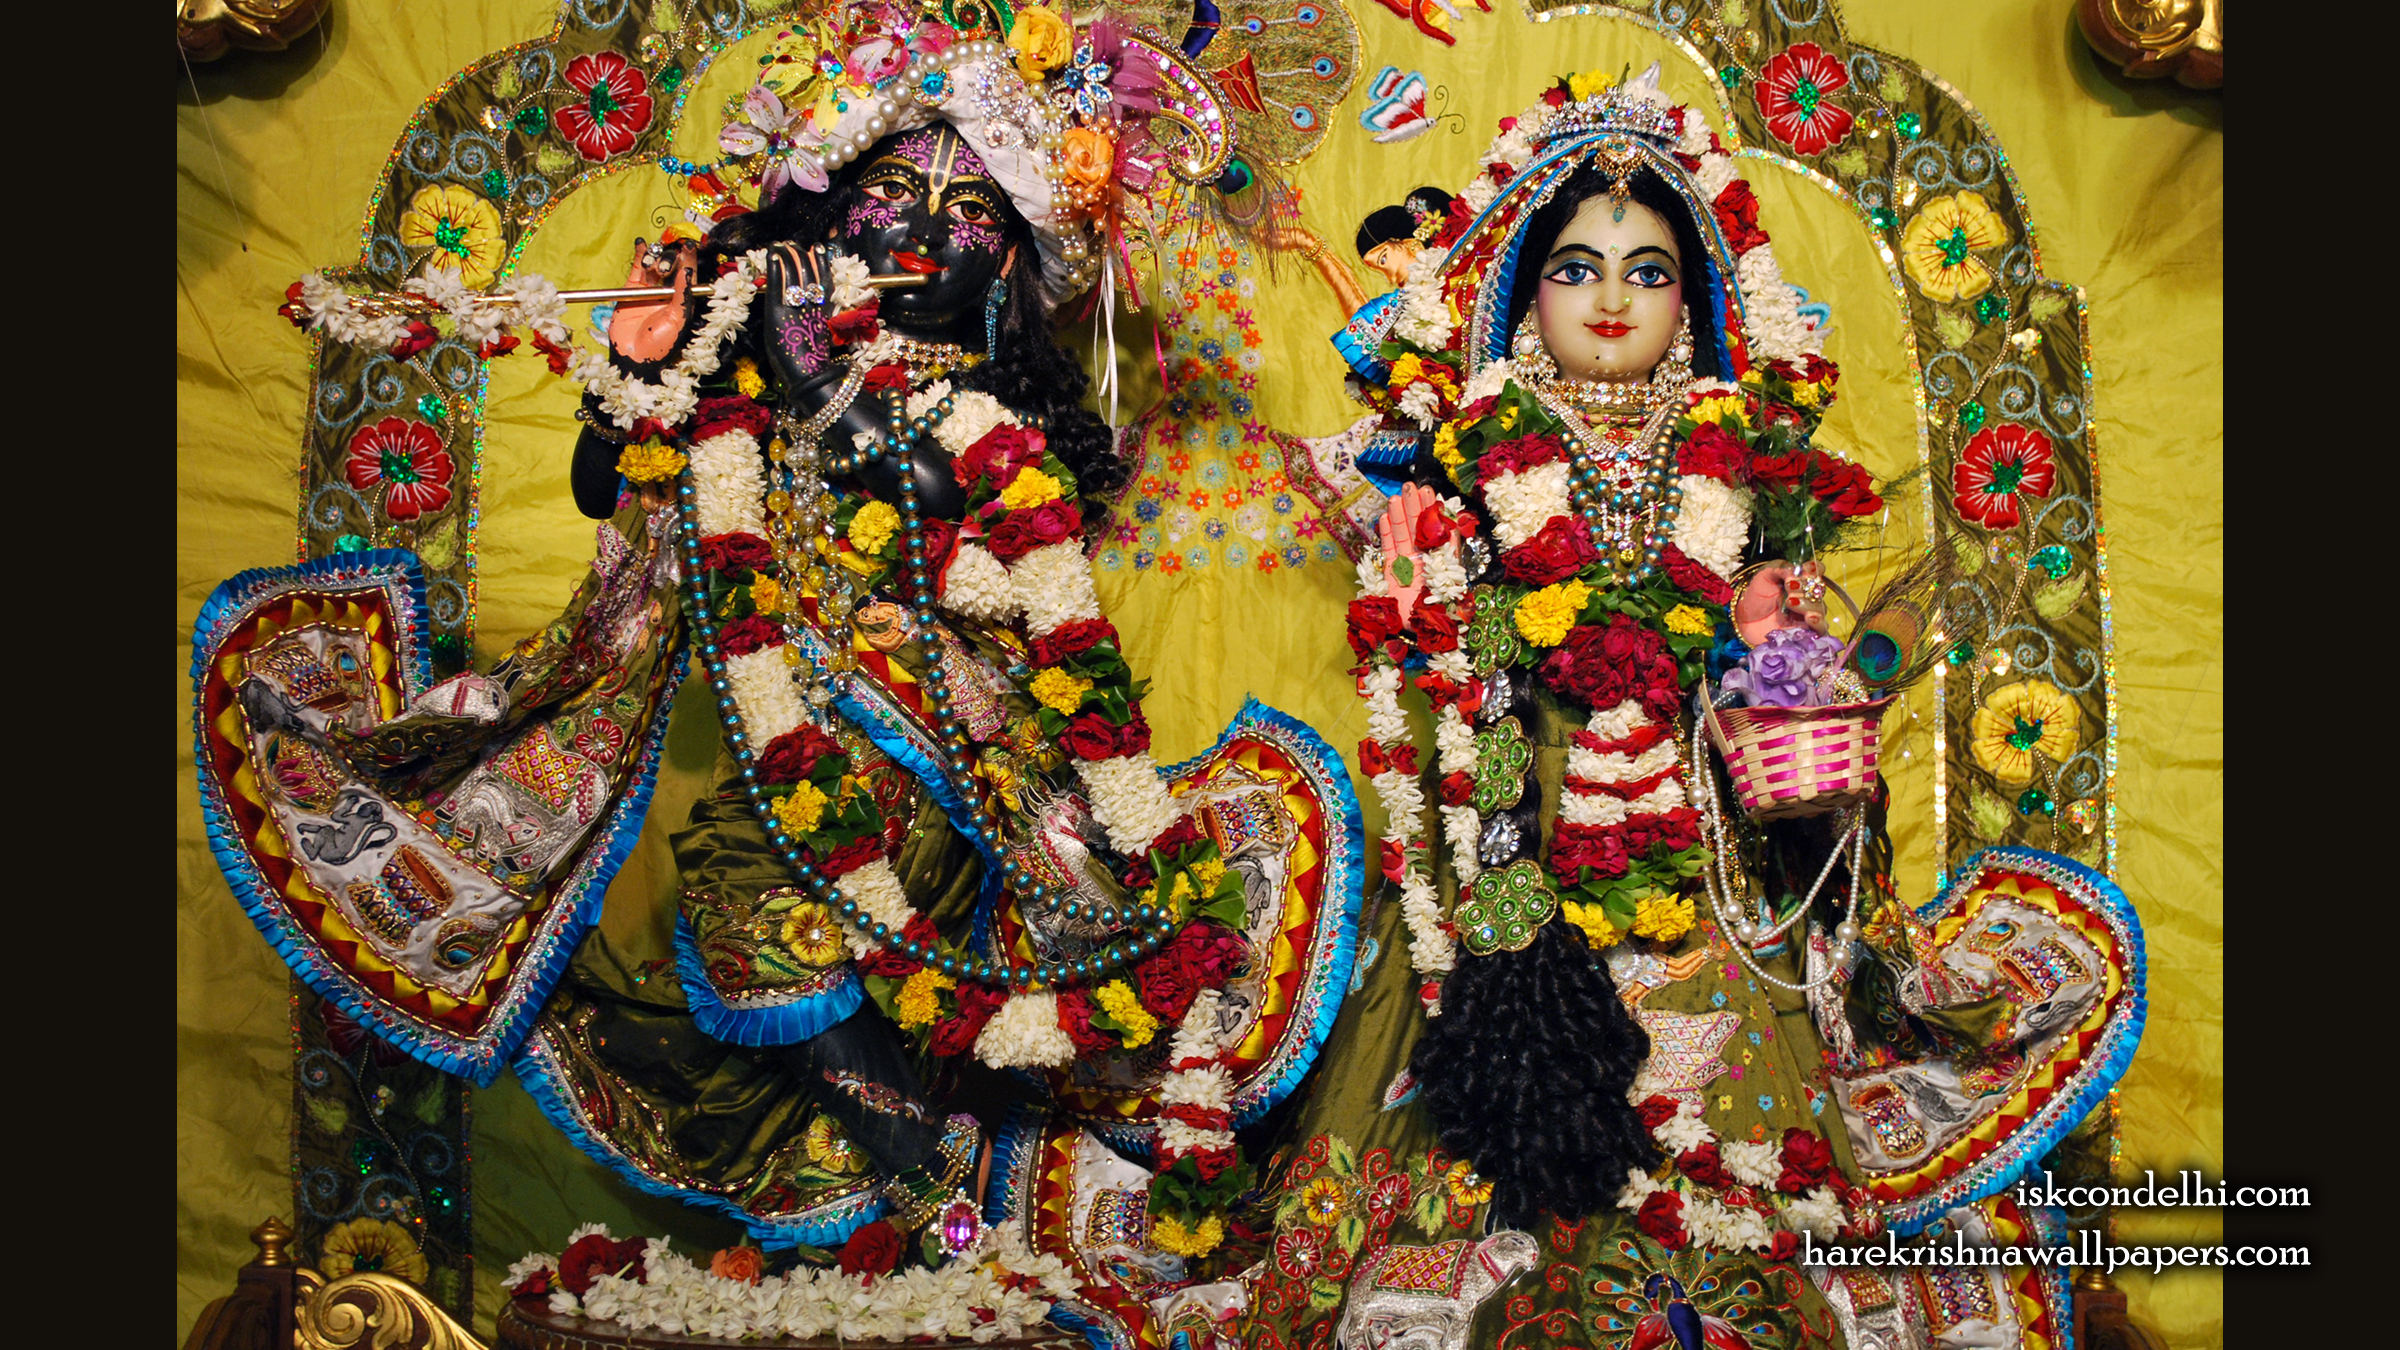 Sri Sri Radha Parthasarathi Wallpaper (007) Size 2400x1350 Download